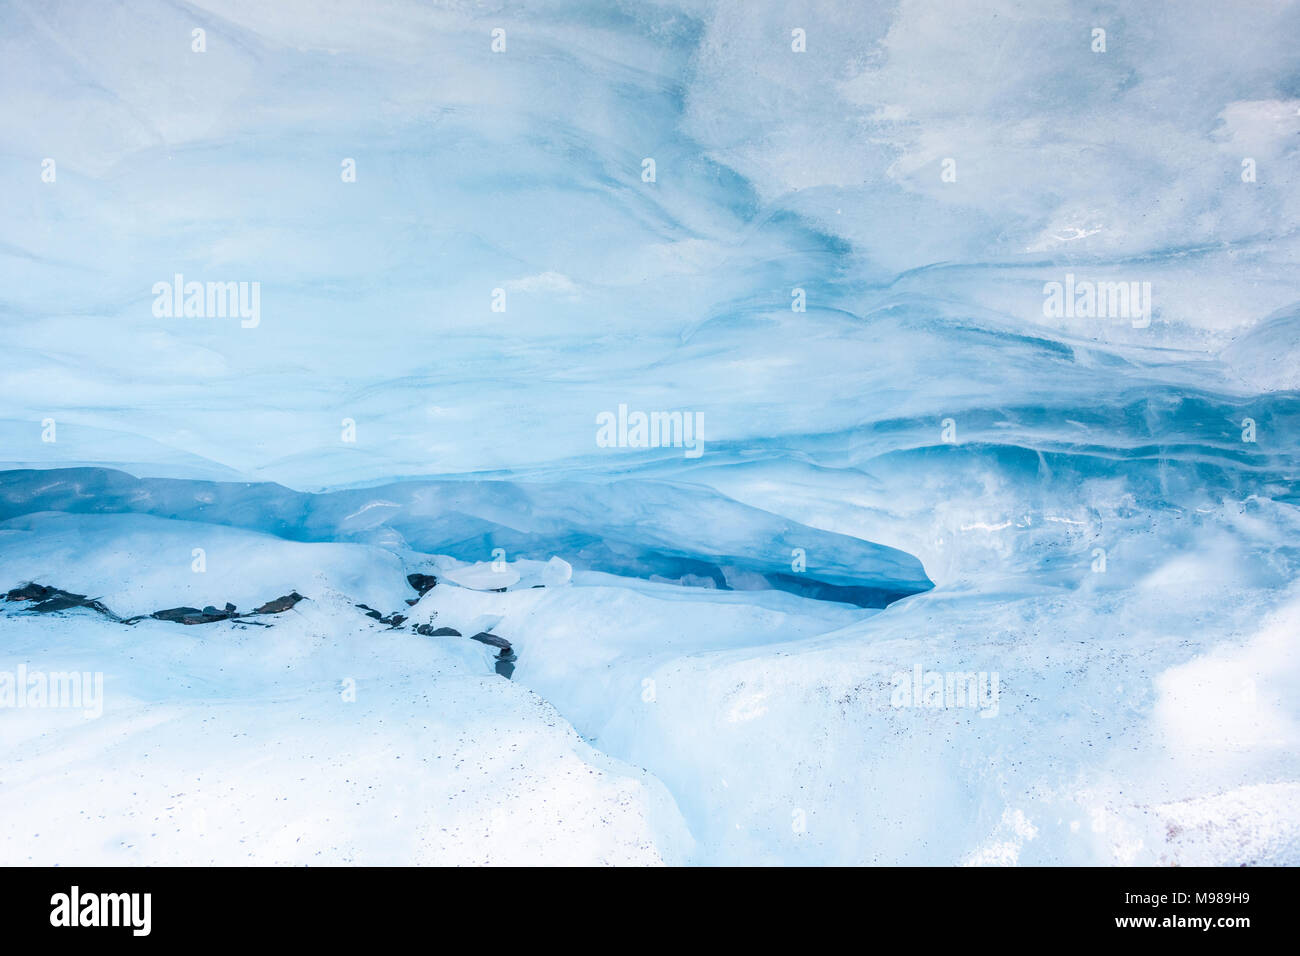 USA, Alaska, Valdez Glacier, Ice cave, ice crevice - Stock Image